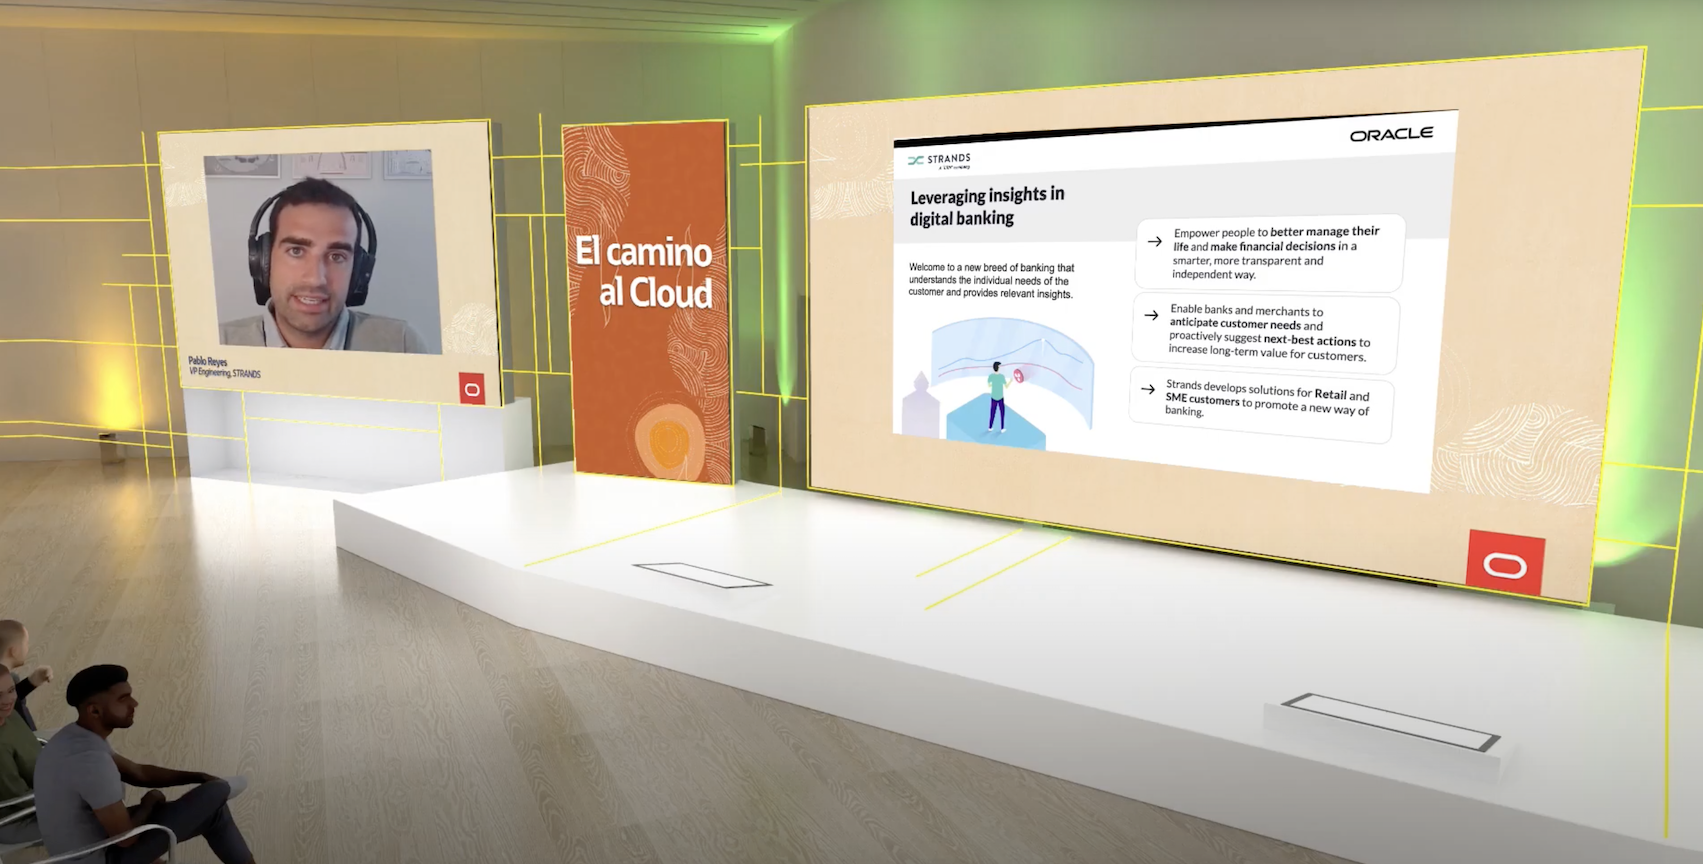 Oracle Event: Strands' Pablo Reyes Joins 'Cloud Revolution'